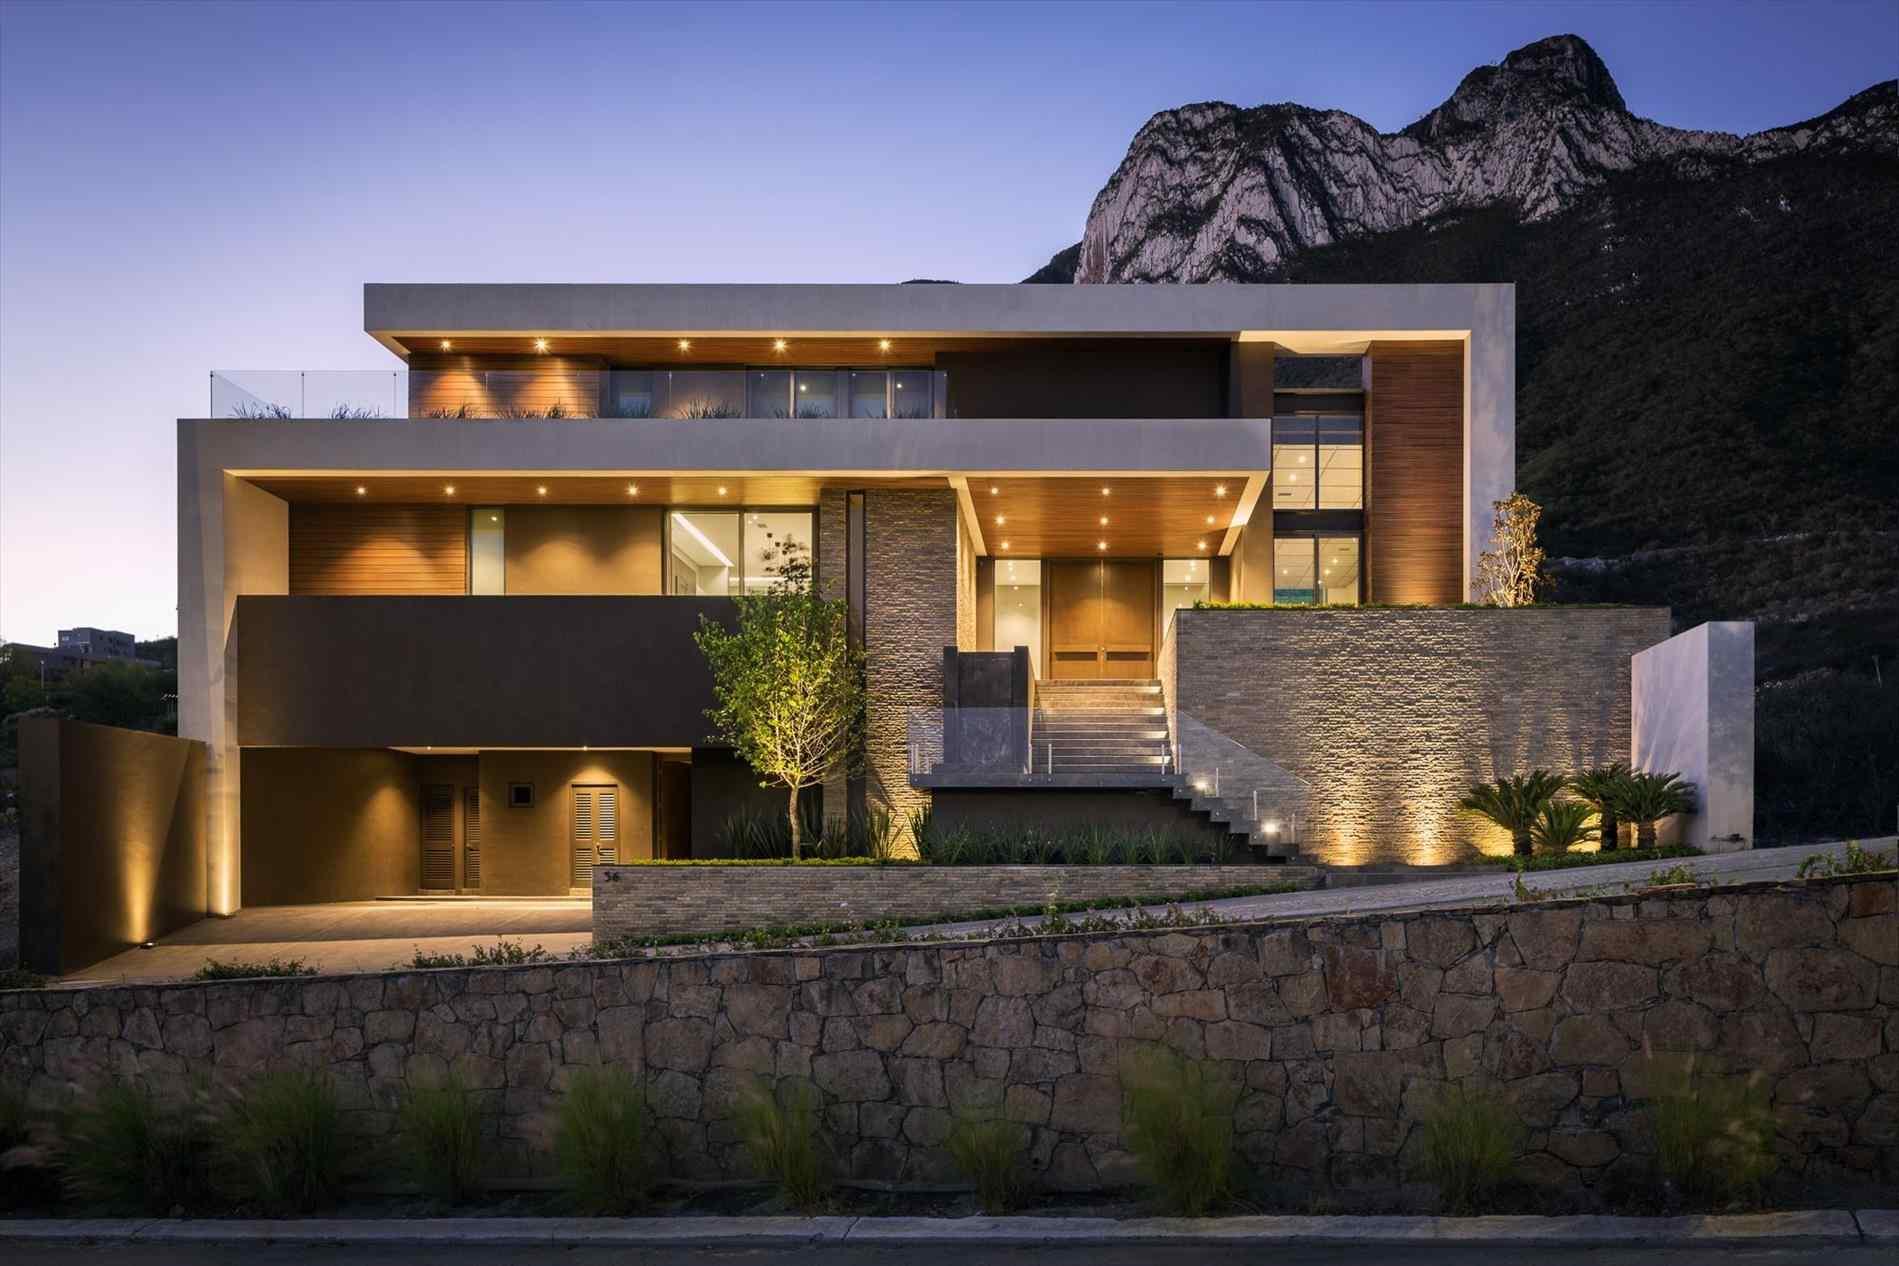 Modern Luxury House Plans Designs Home Plans Blueprints 95686